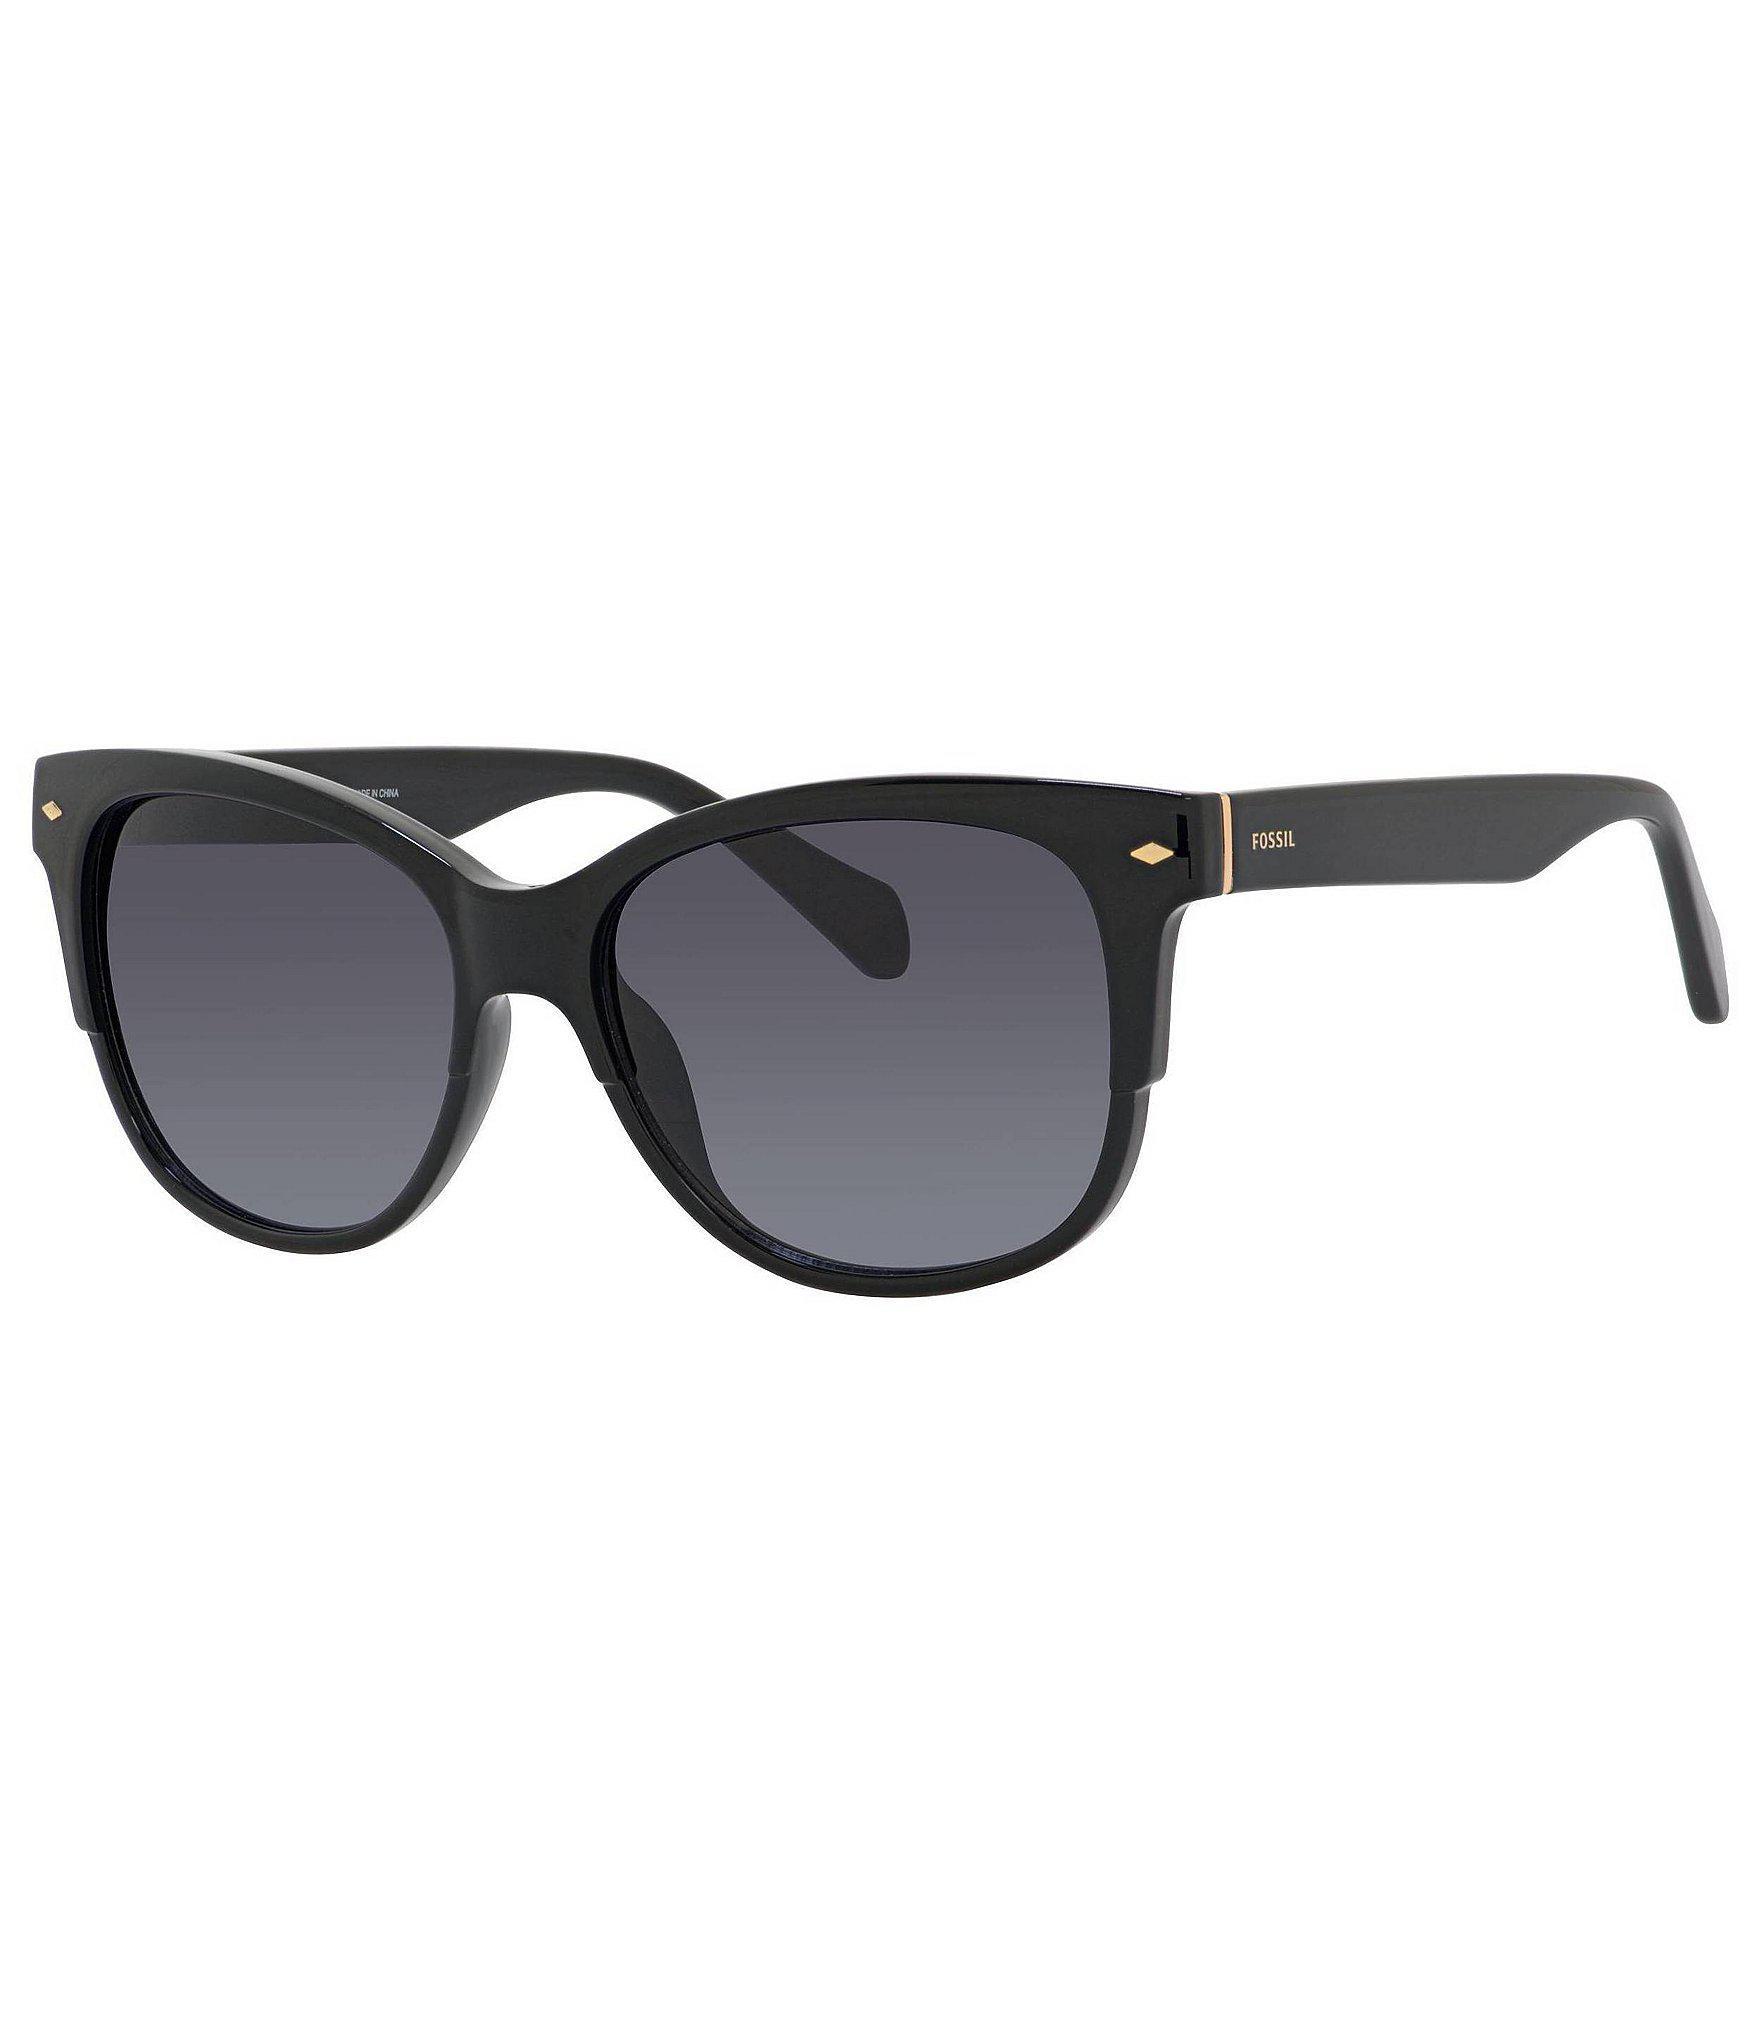 6fa0dee3c9 Fossil - Black Retro Rectangular Sunglasses - Lyst. View fullscreen